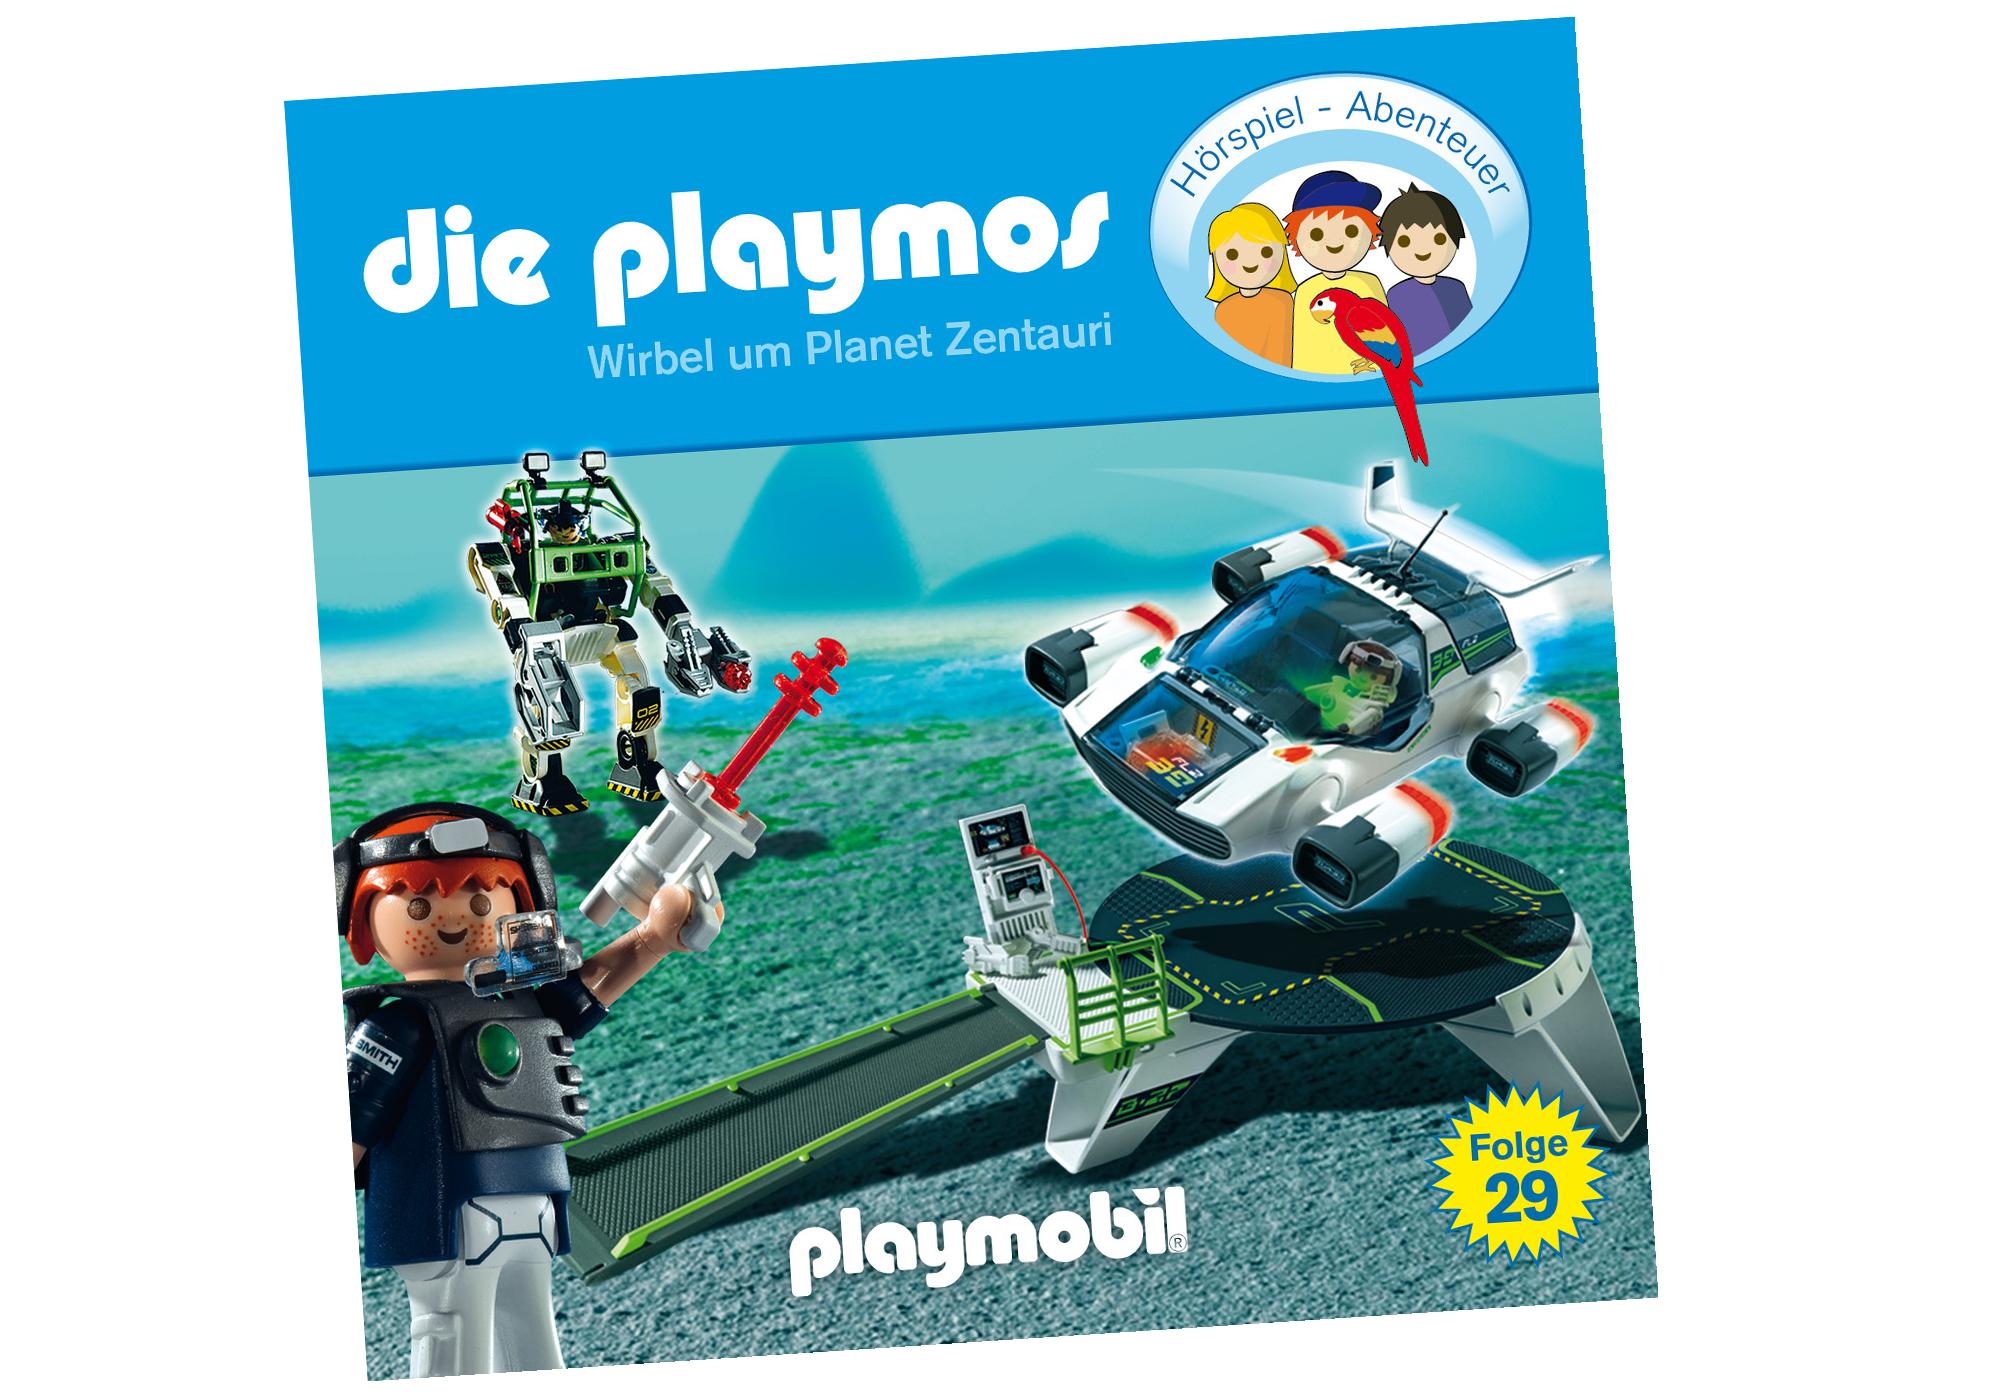 http://media.playmobil.com/i/playmobil/80345_product_detail